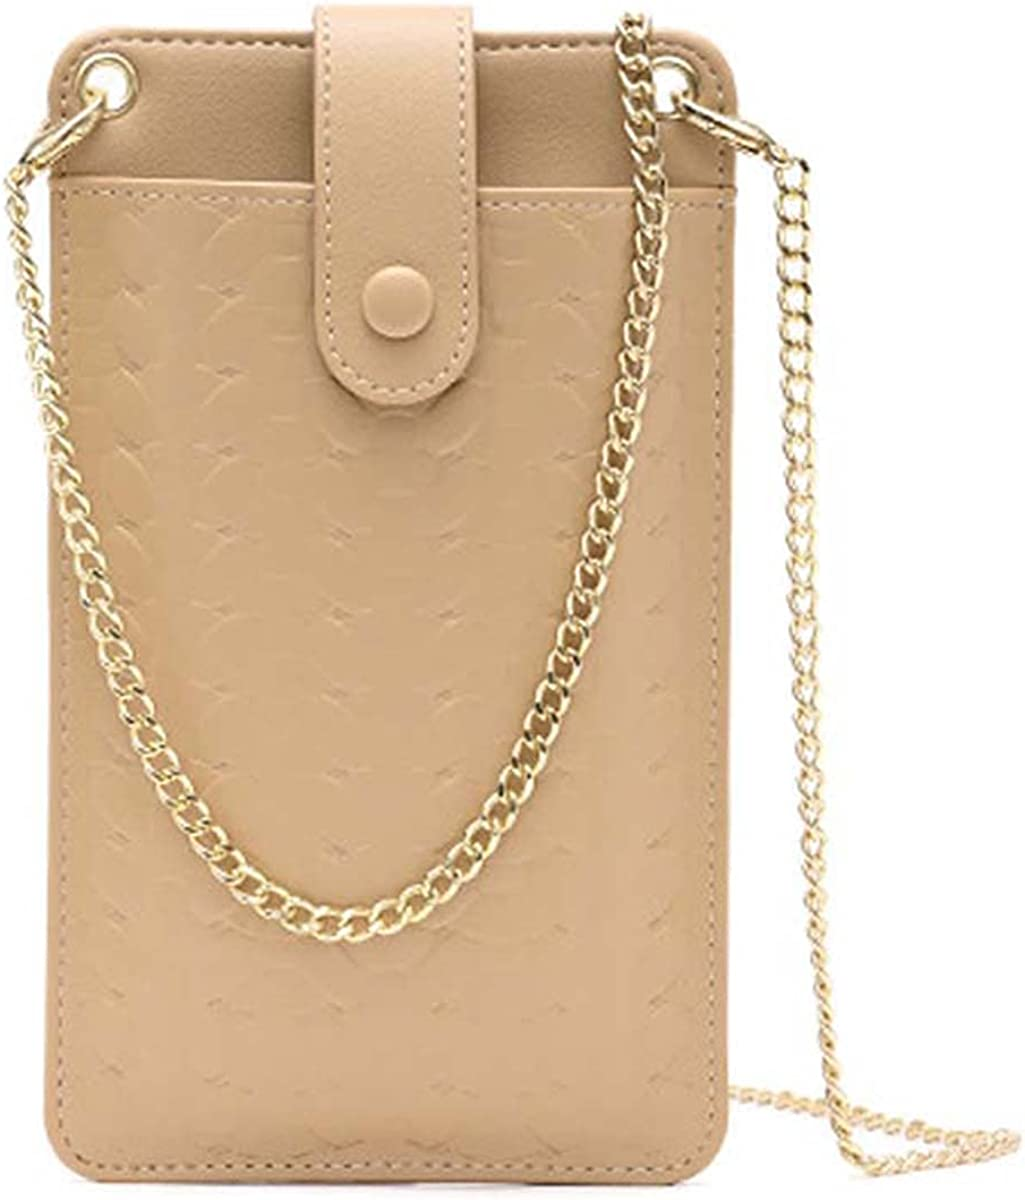 Womens Crossbody Cellphone Bag Rapid rise Tucson Mall Small Chian Shoulder Woven Purse